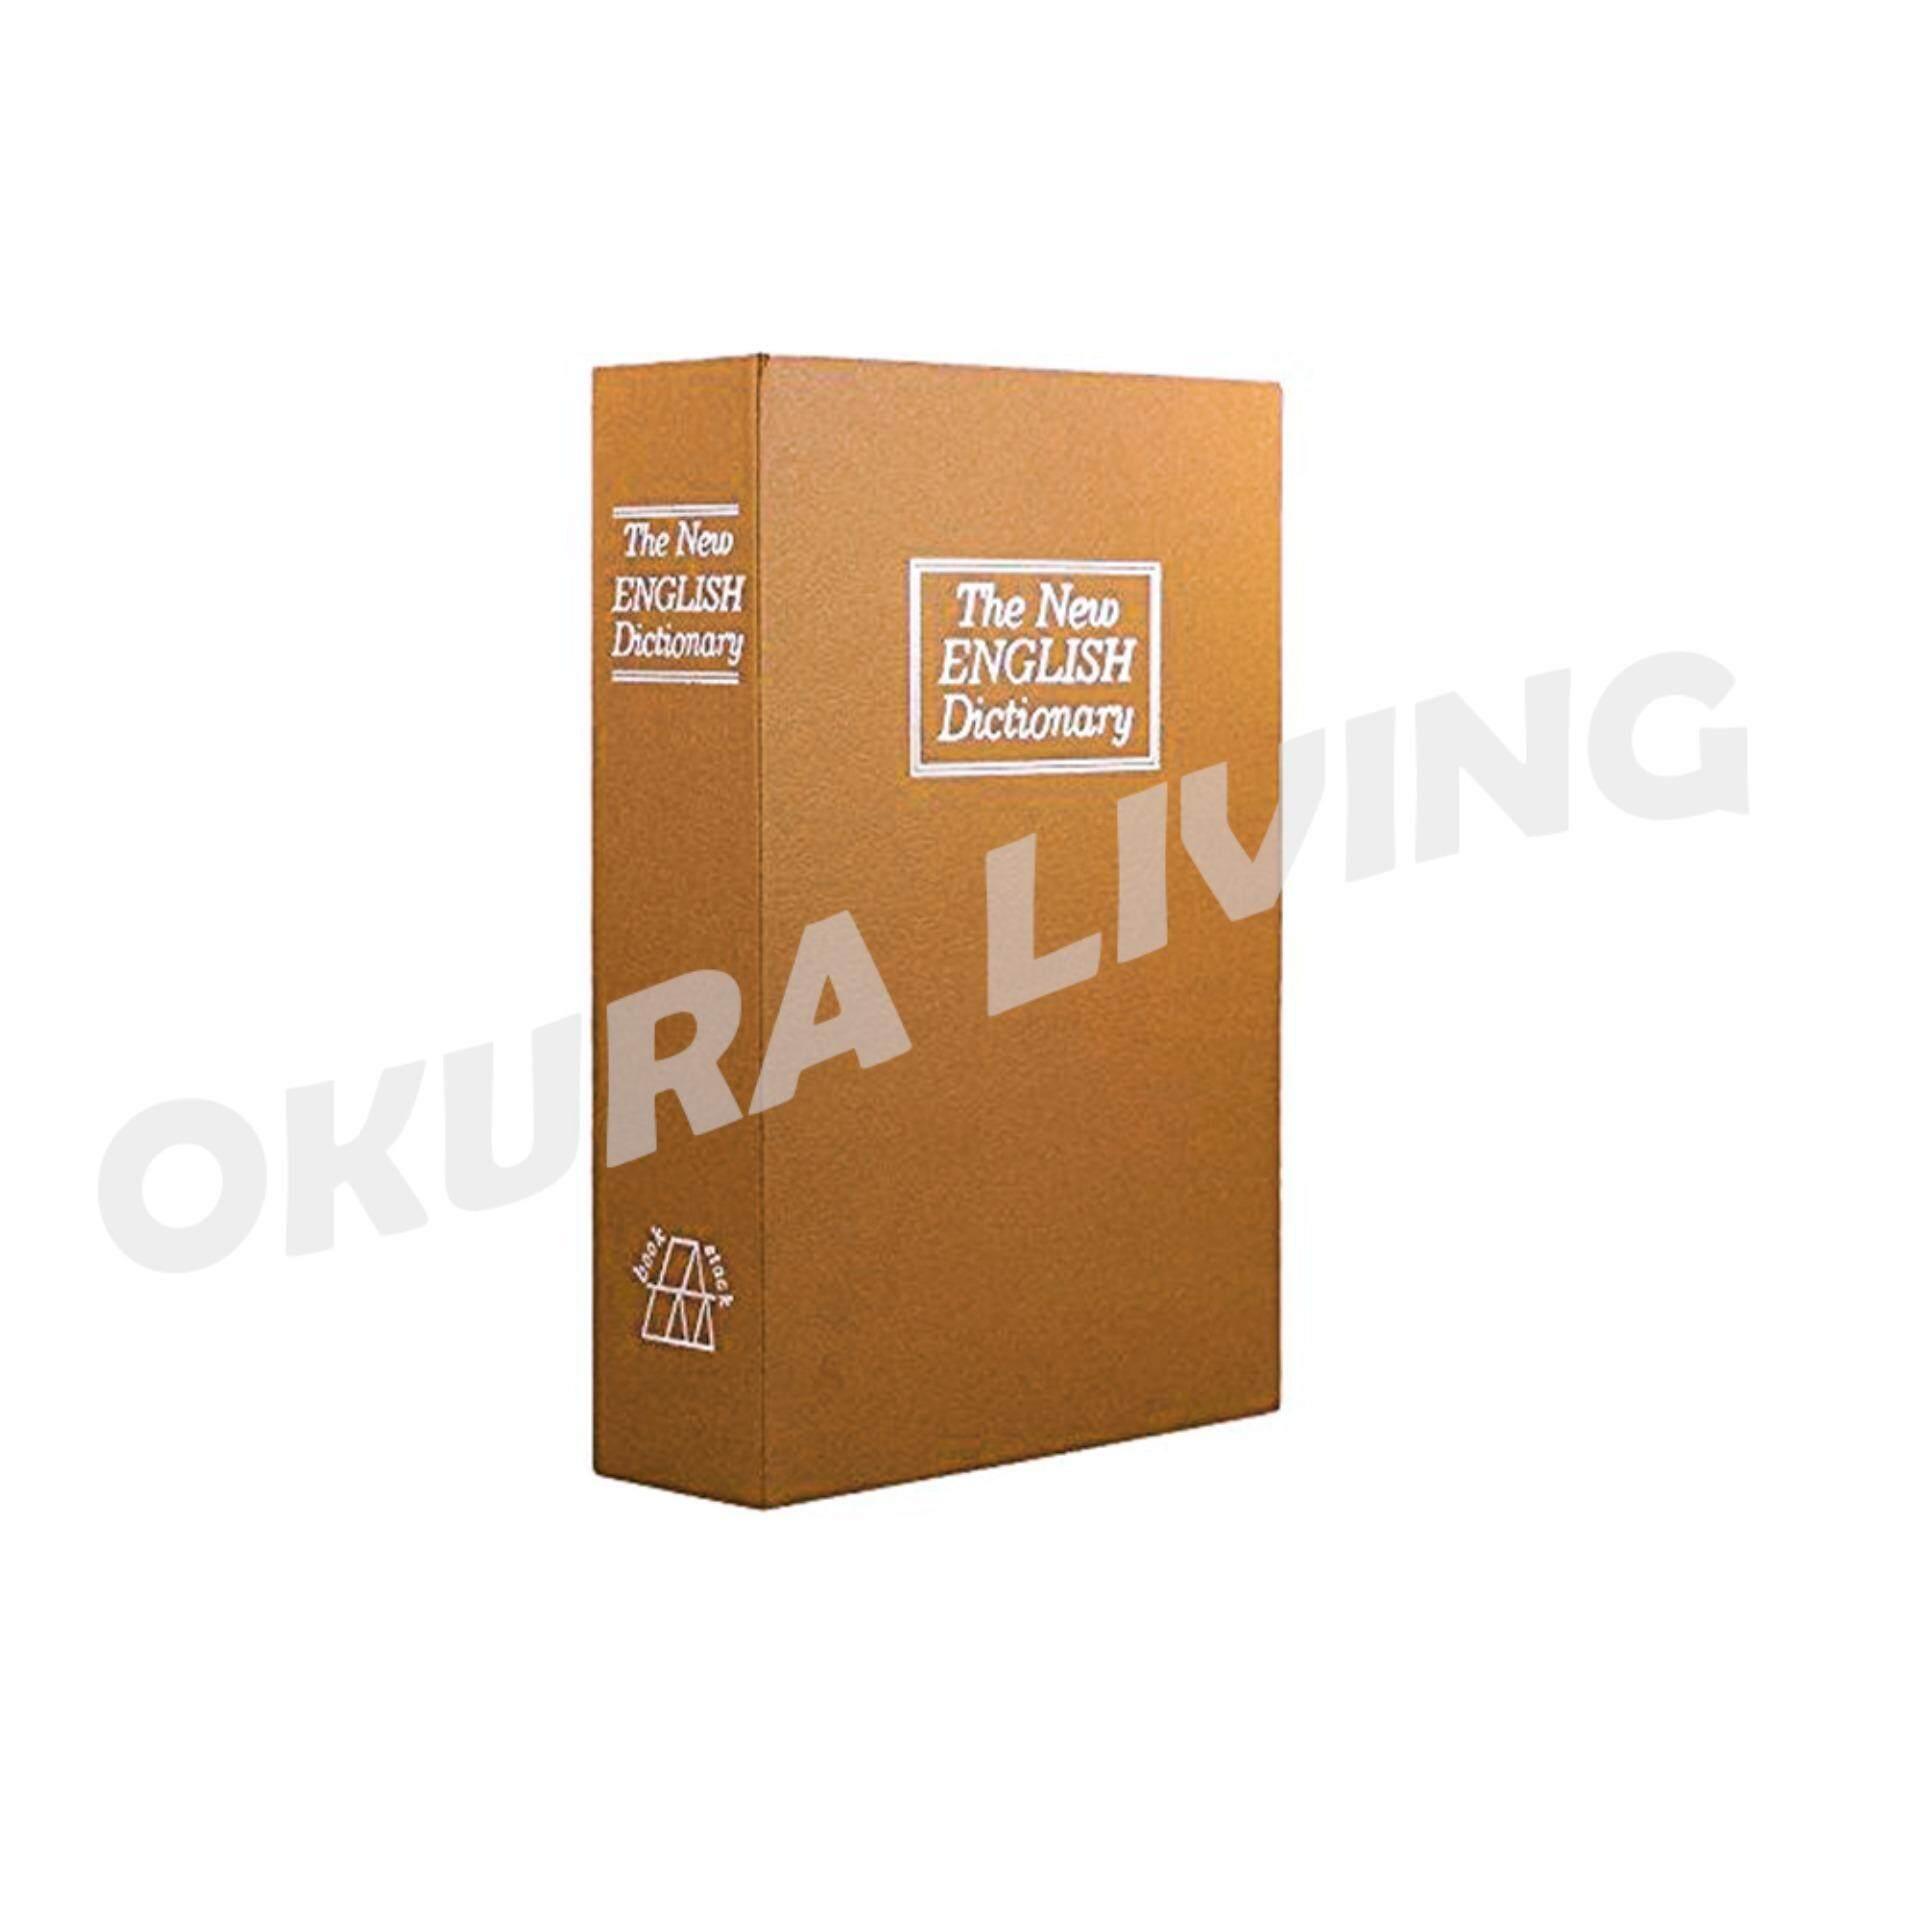 OKURA Dictionary Diversion Secret Hidden Book Safe Metal Box with Key Lock 8